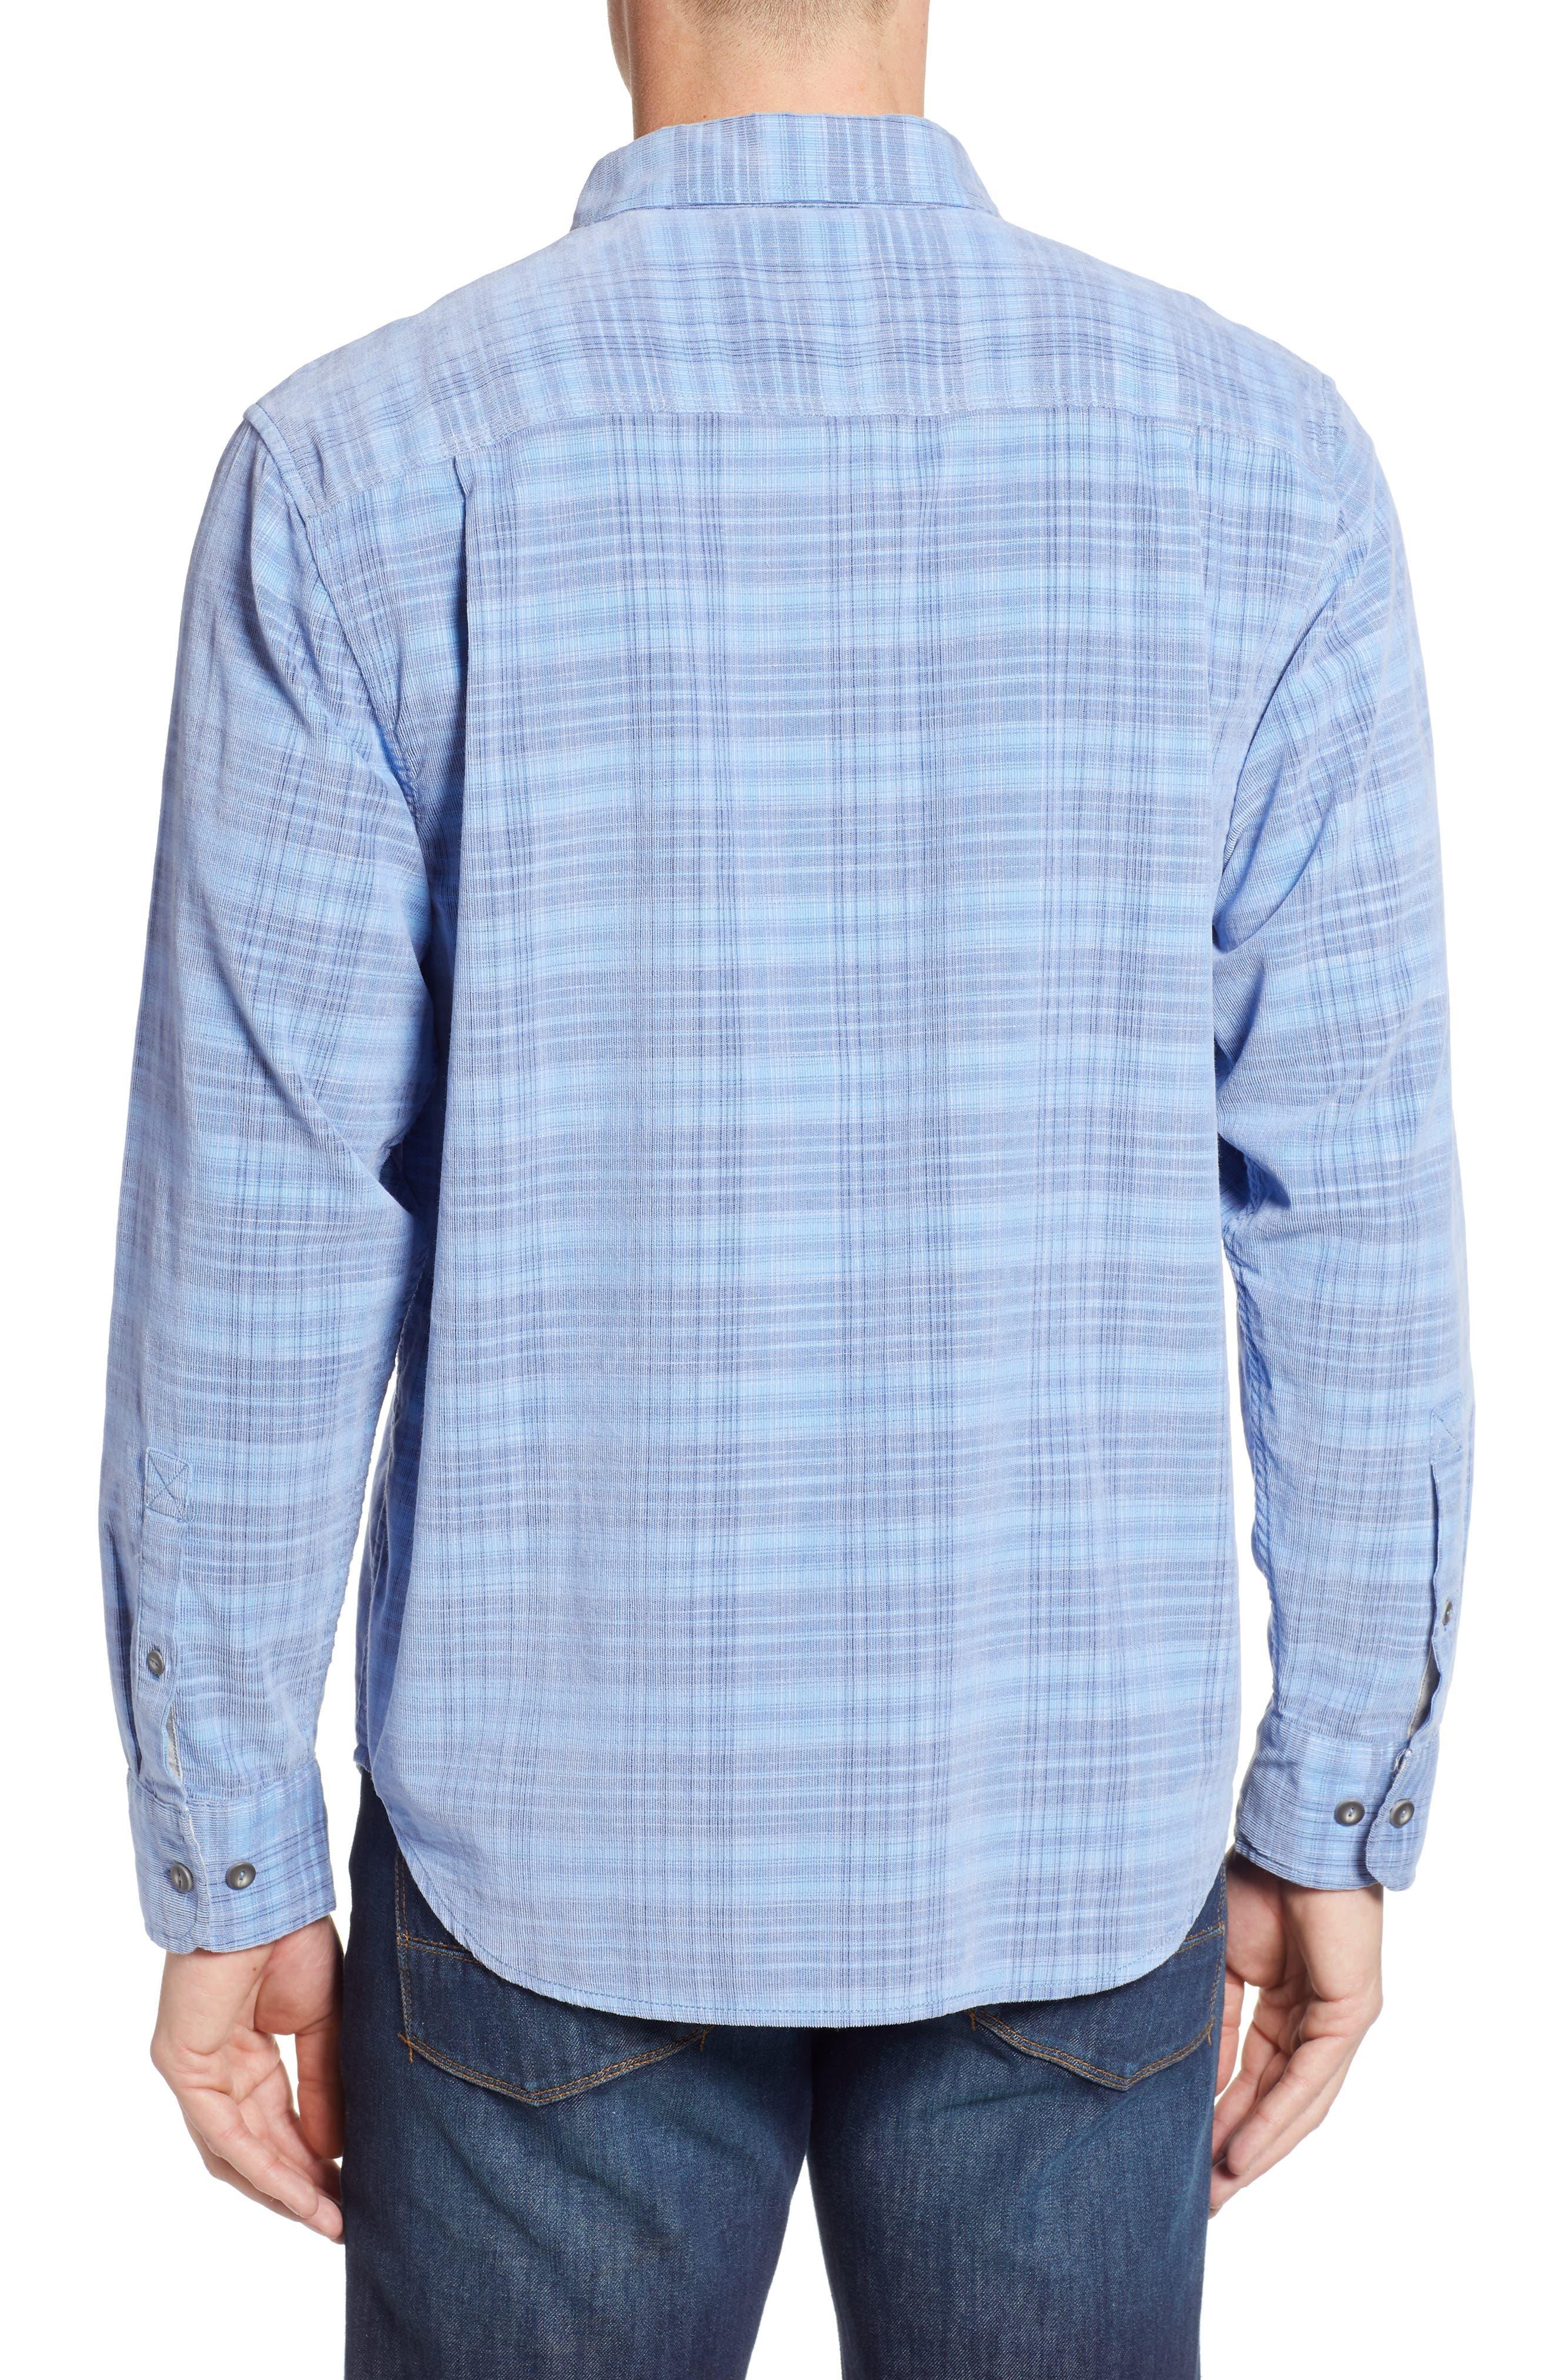 Cruzy Corduroy Shirt,                             Alternate thumbnail 2, color,                             RIVIERA AZURE